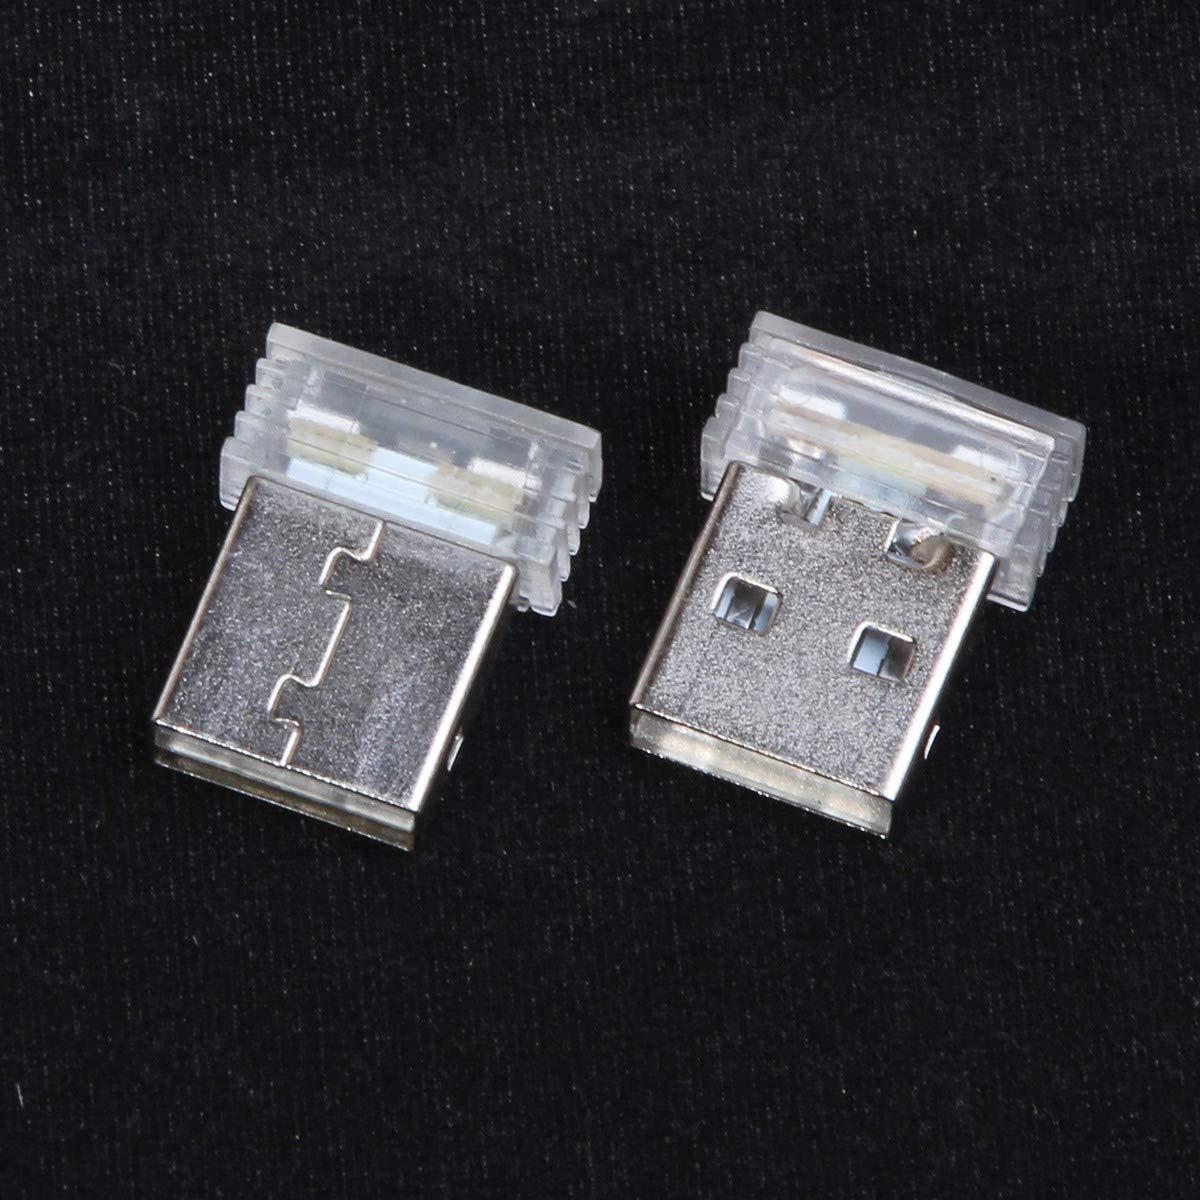 TOOGOO Mini USB Led Light Night Lamp Atmosphere Wireless Car Light Foot Lamp Dc 5V Auto Interior Decoration Lamp Styling Ice Blue